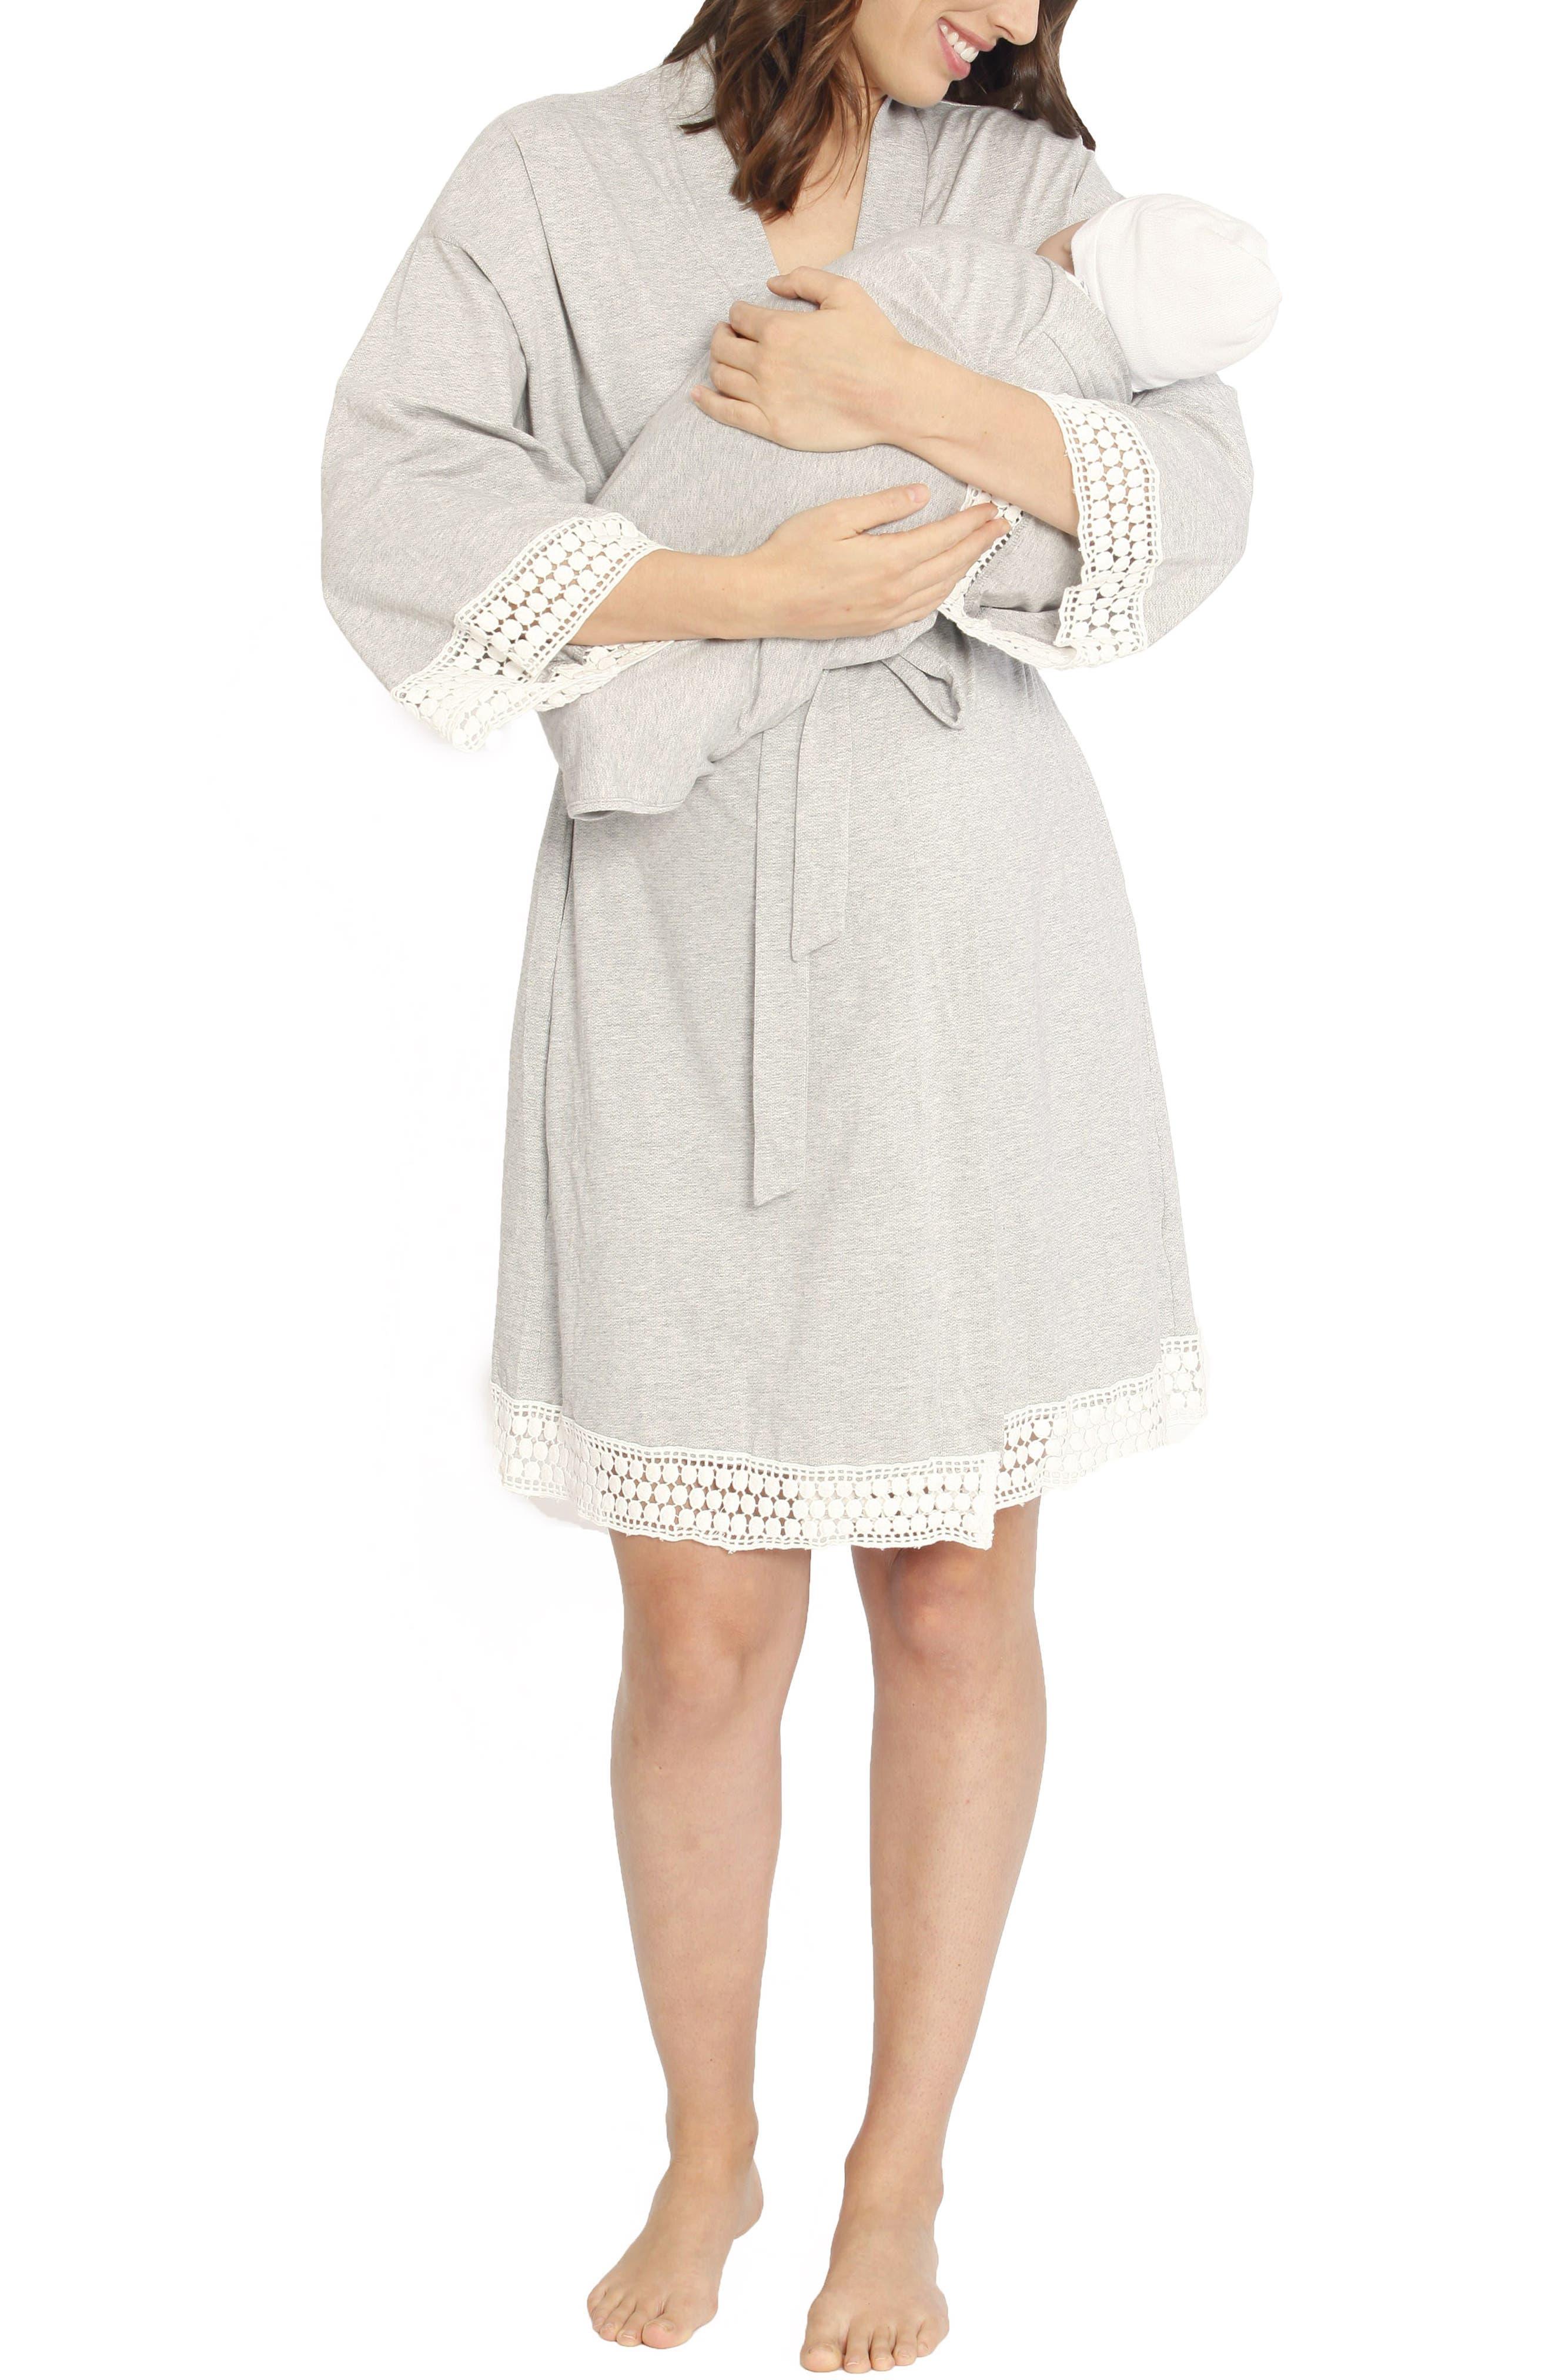 Nursing/Maternity Dress, Robe & Baby Wrap Set,                             Alternate thumbnail 2, color,                             GREY/ WHITE